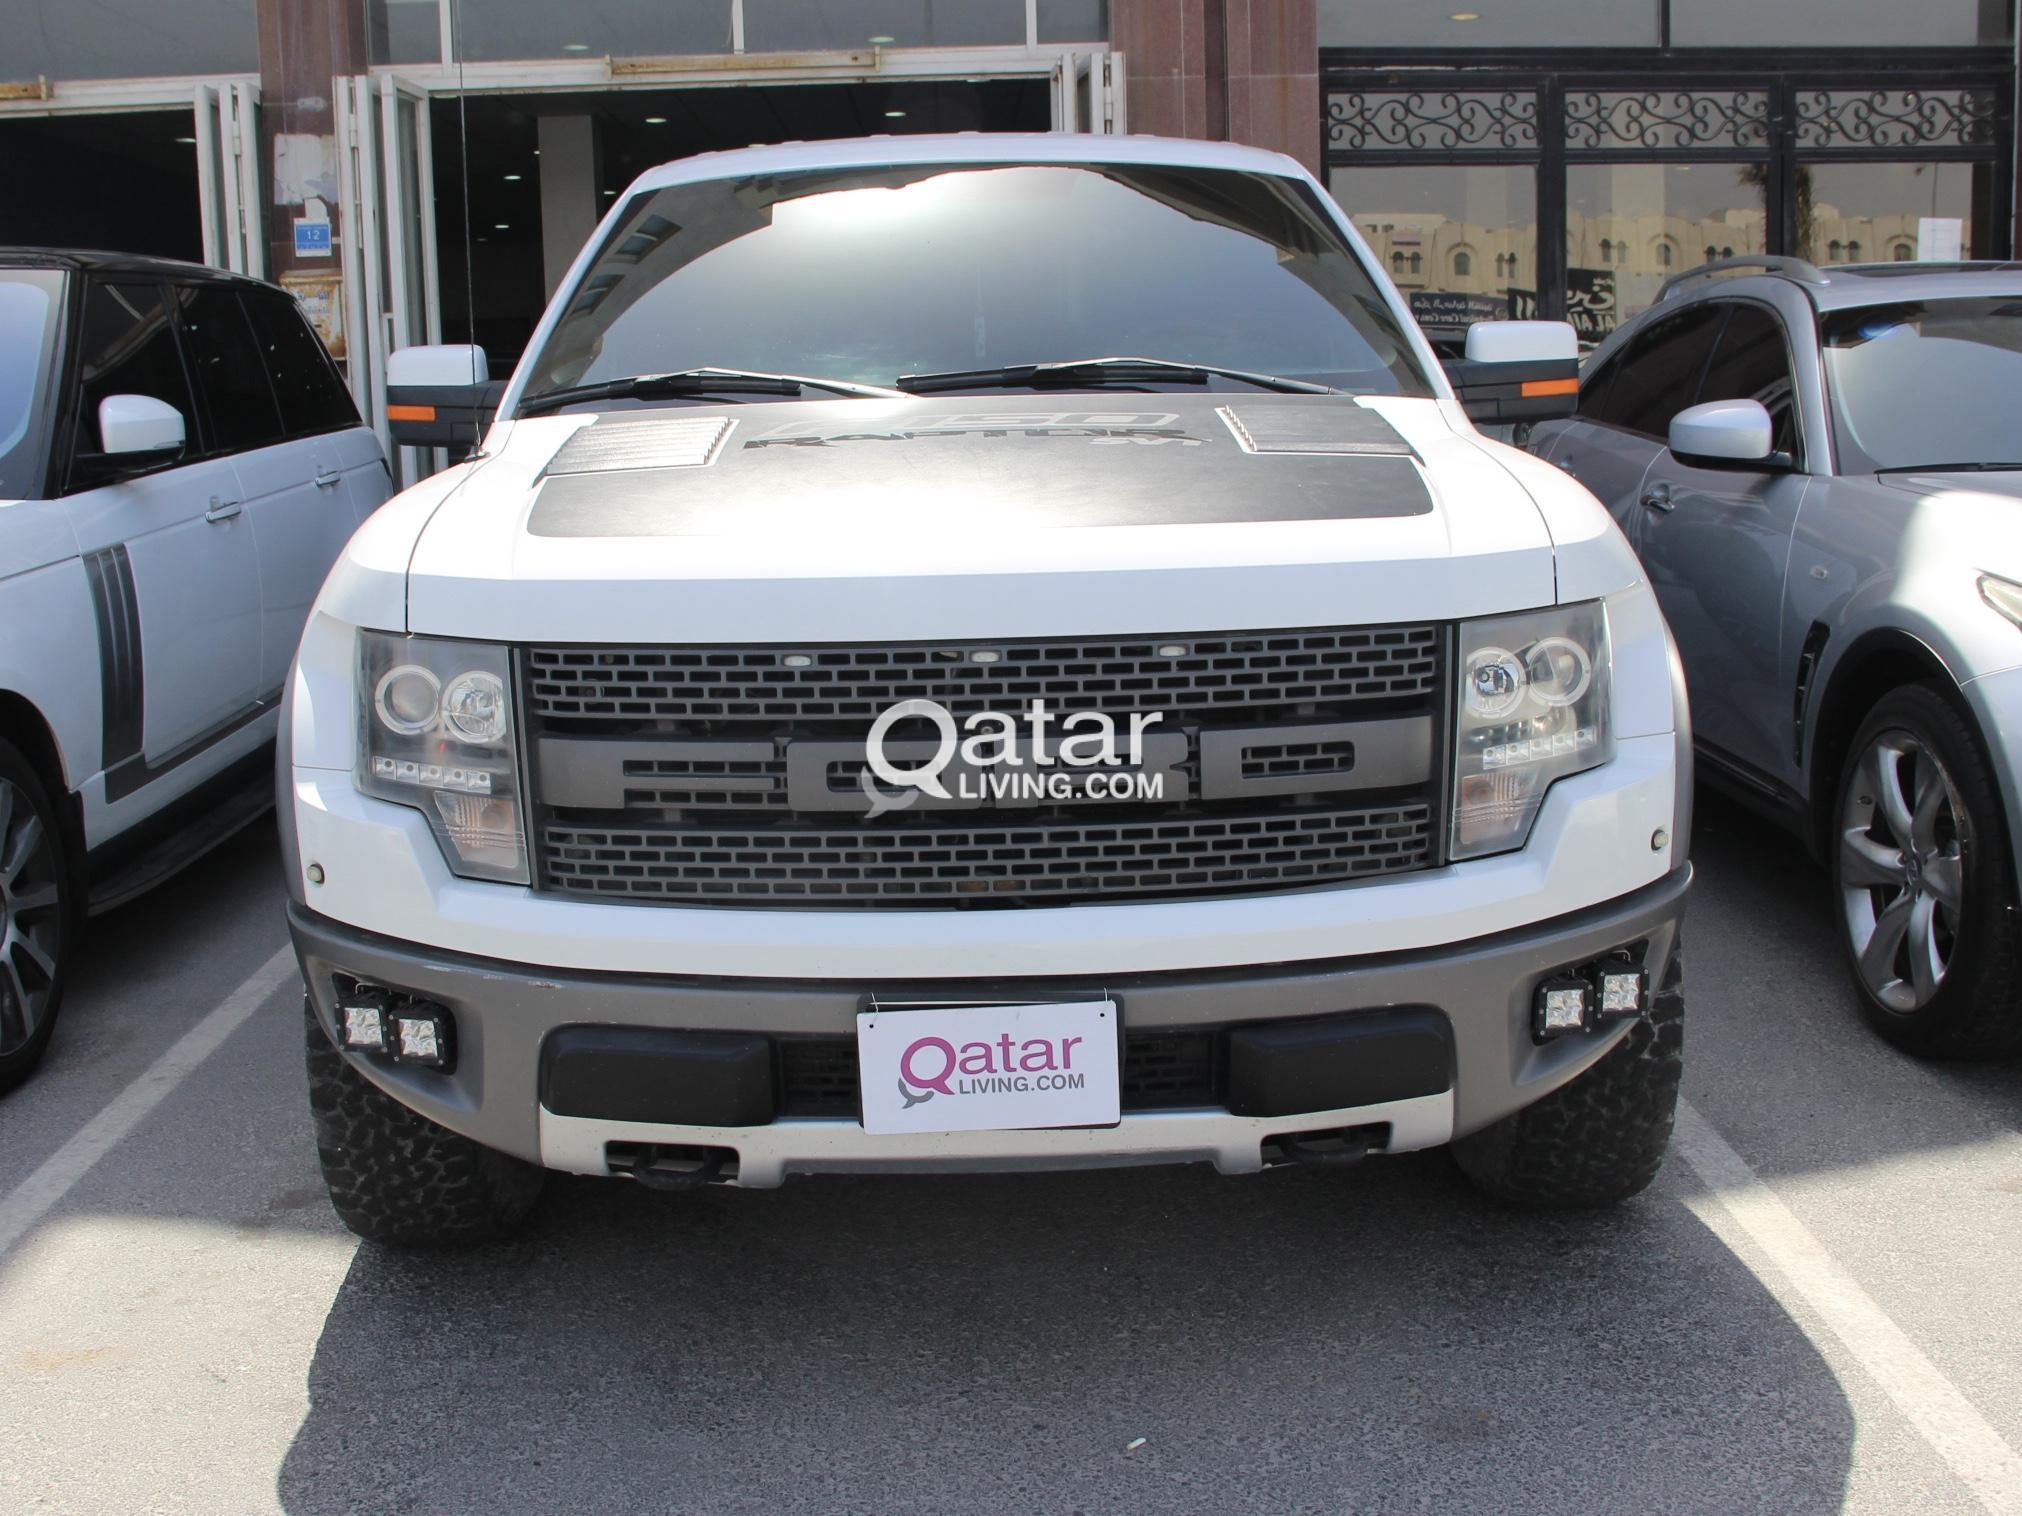 Ford Raptor 2014 Qatar Living